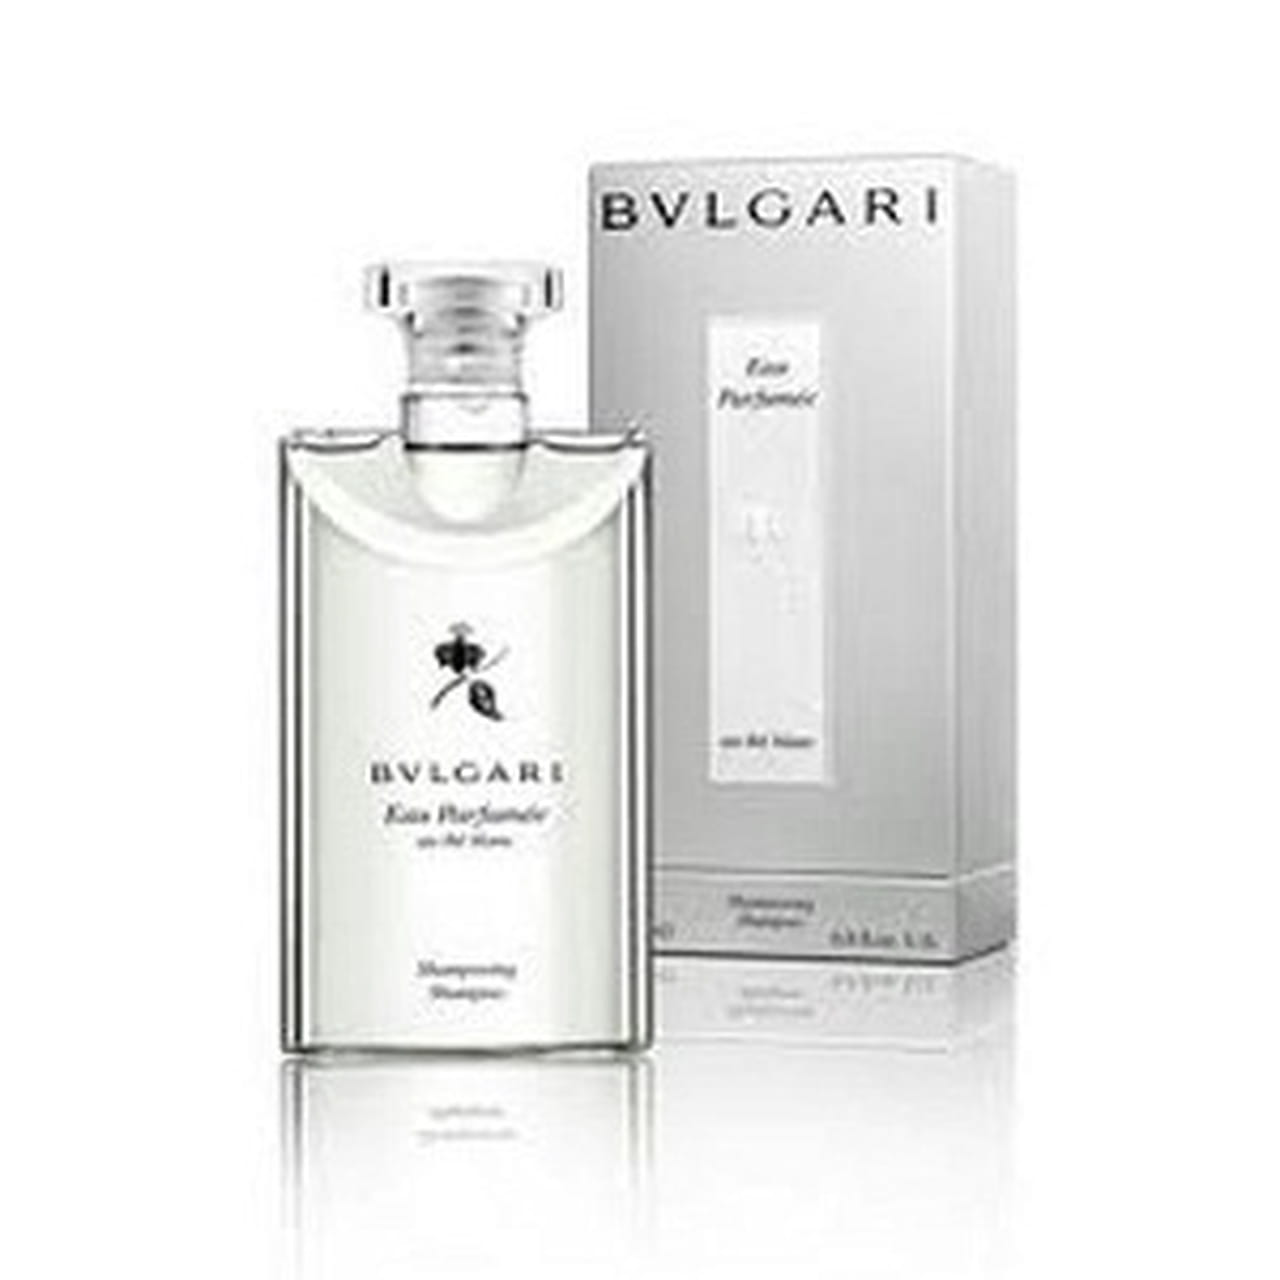 98c1b8899 10- BVLGARI Au The'blanc Perfume for women, Eau De Perfume